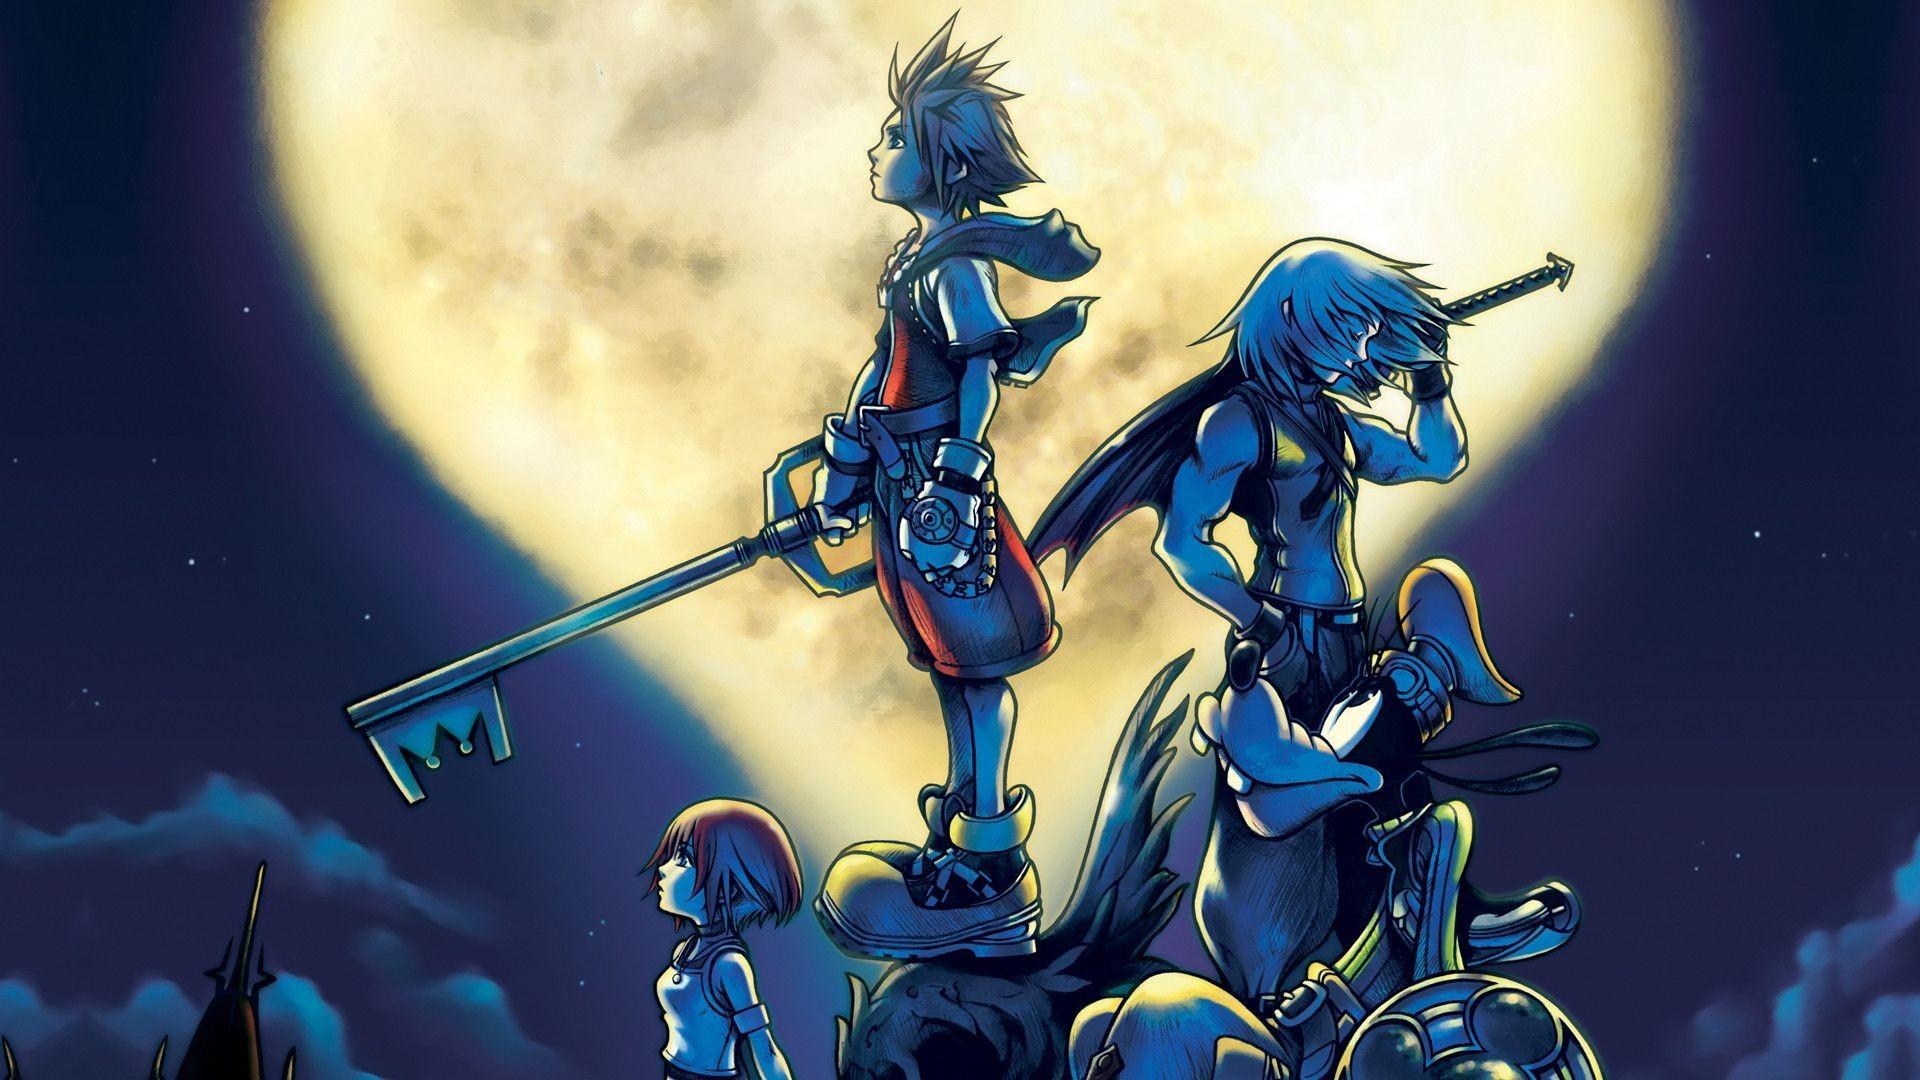 Kingdom Hearts Sora Image …